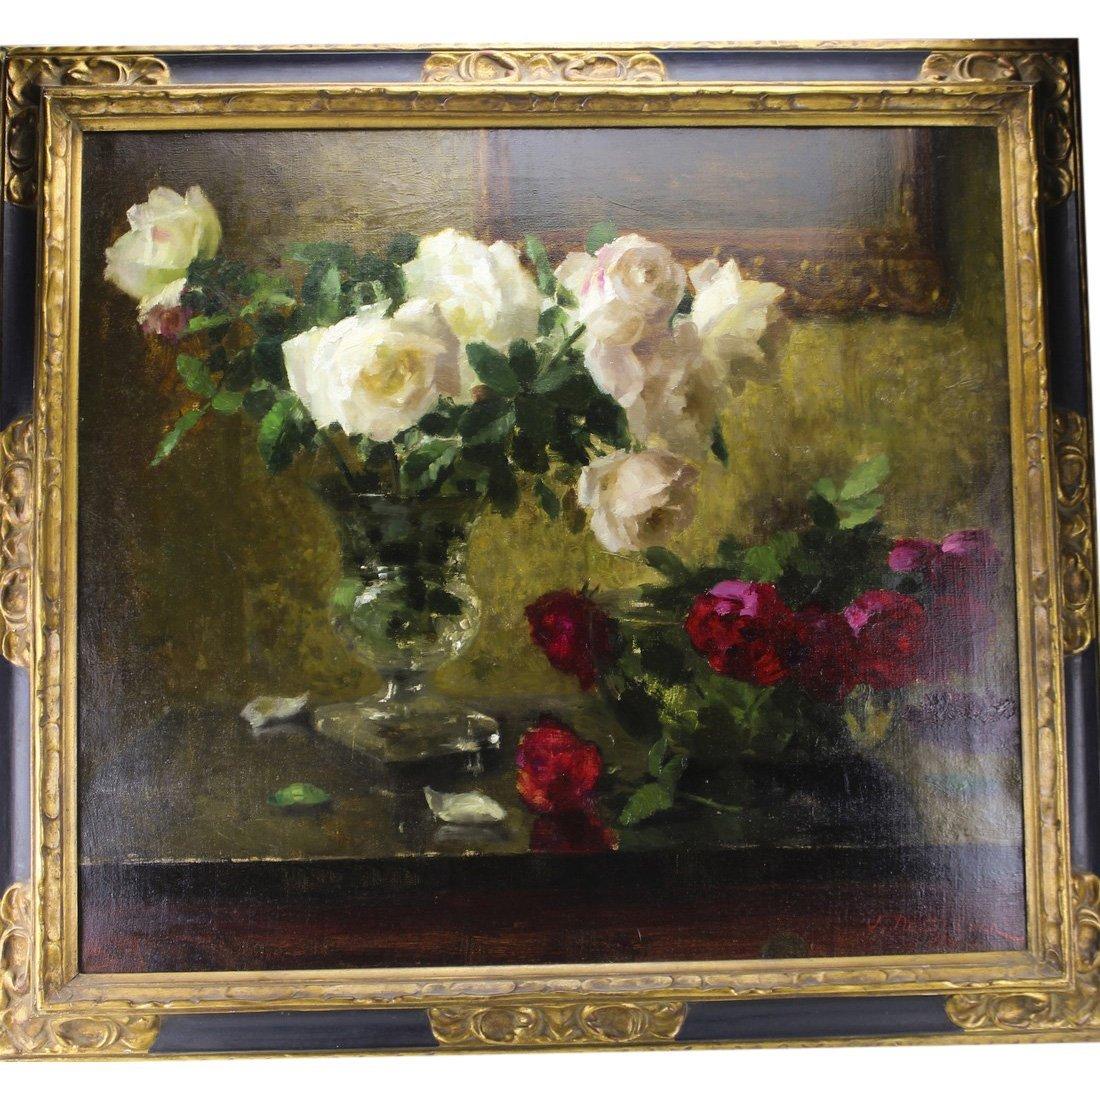 Joseph De Belder: Still Life Painting 19th C